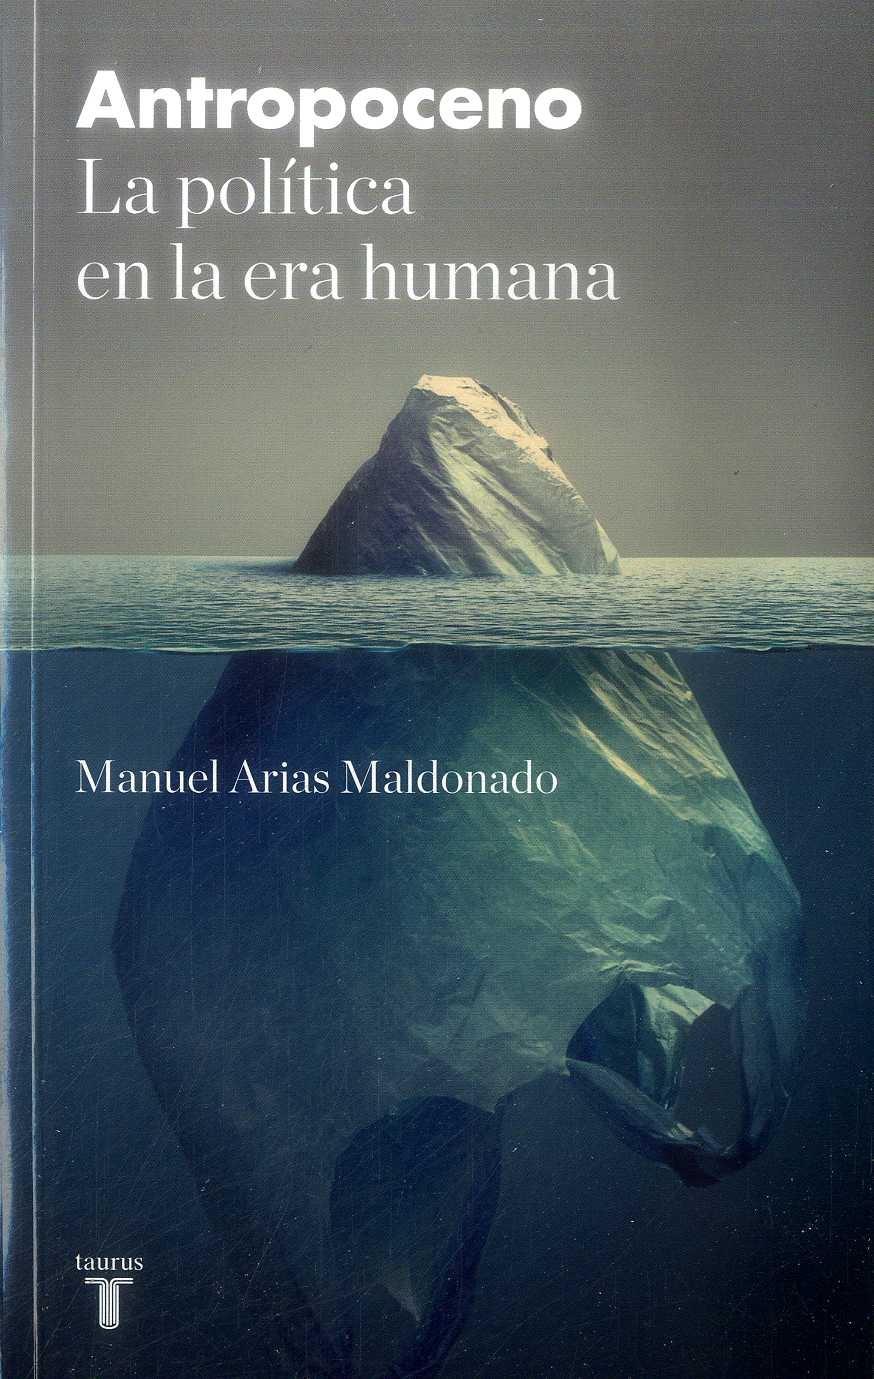 Planeta Antropoceno - Manuel Arias Maldonado - Taurus